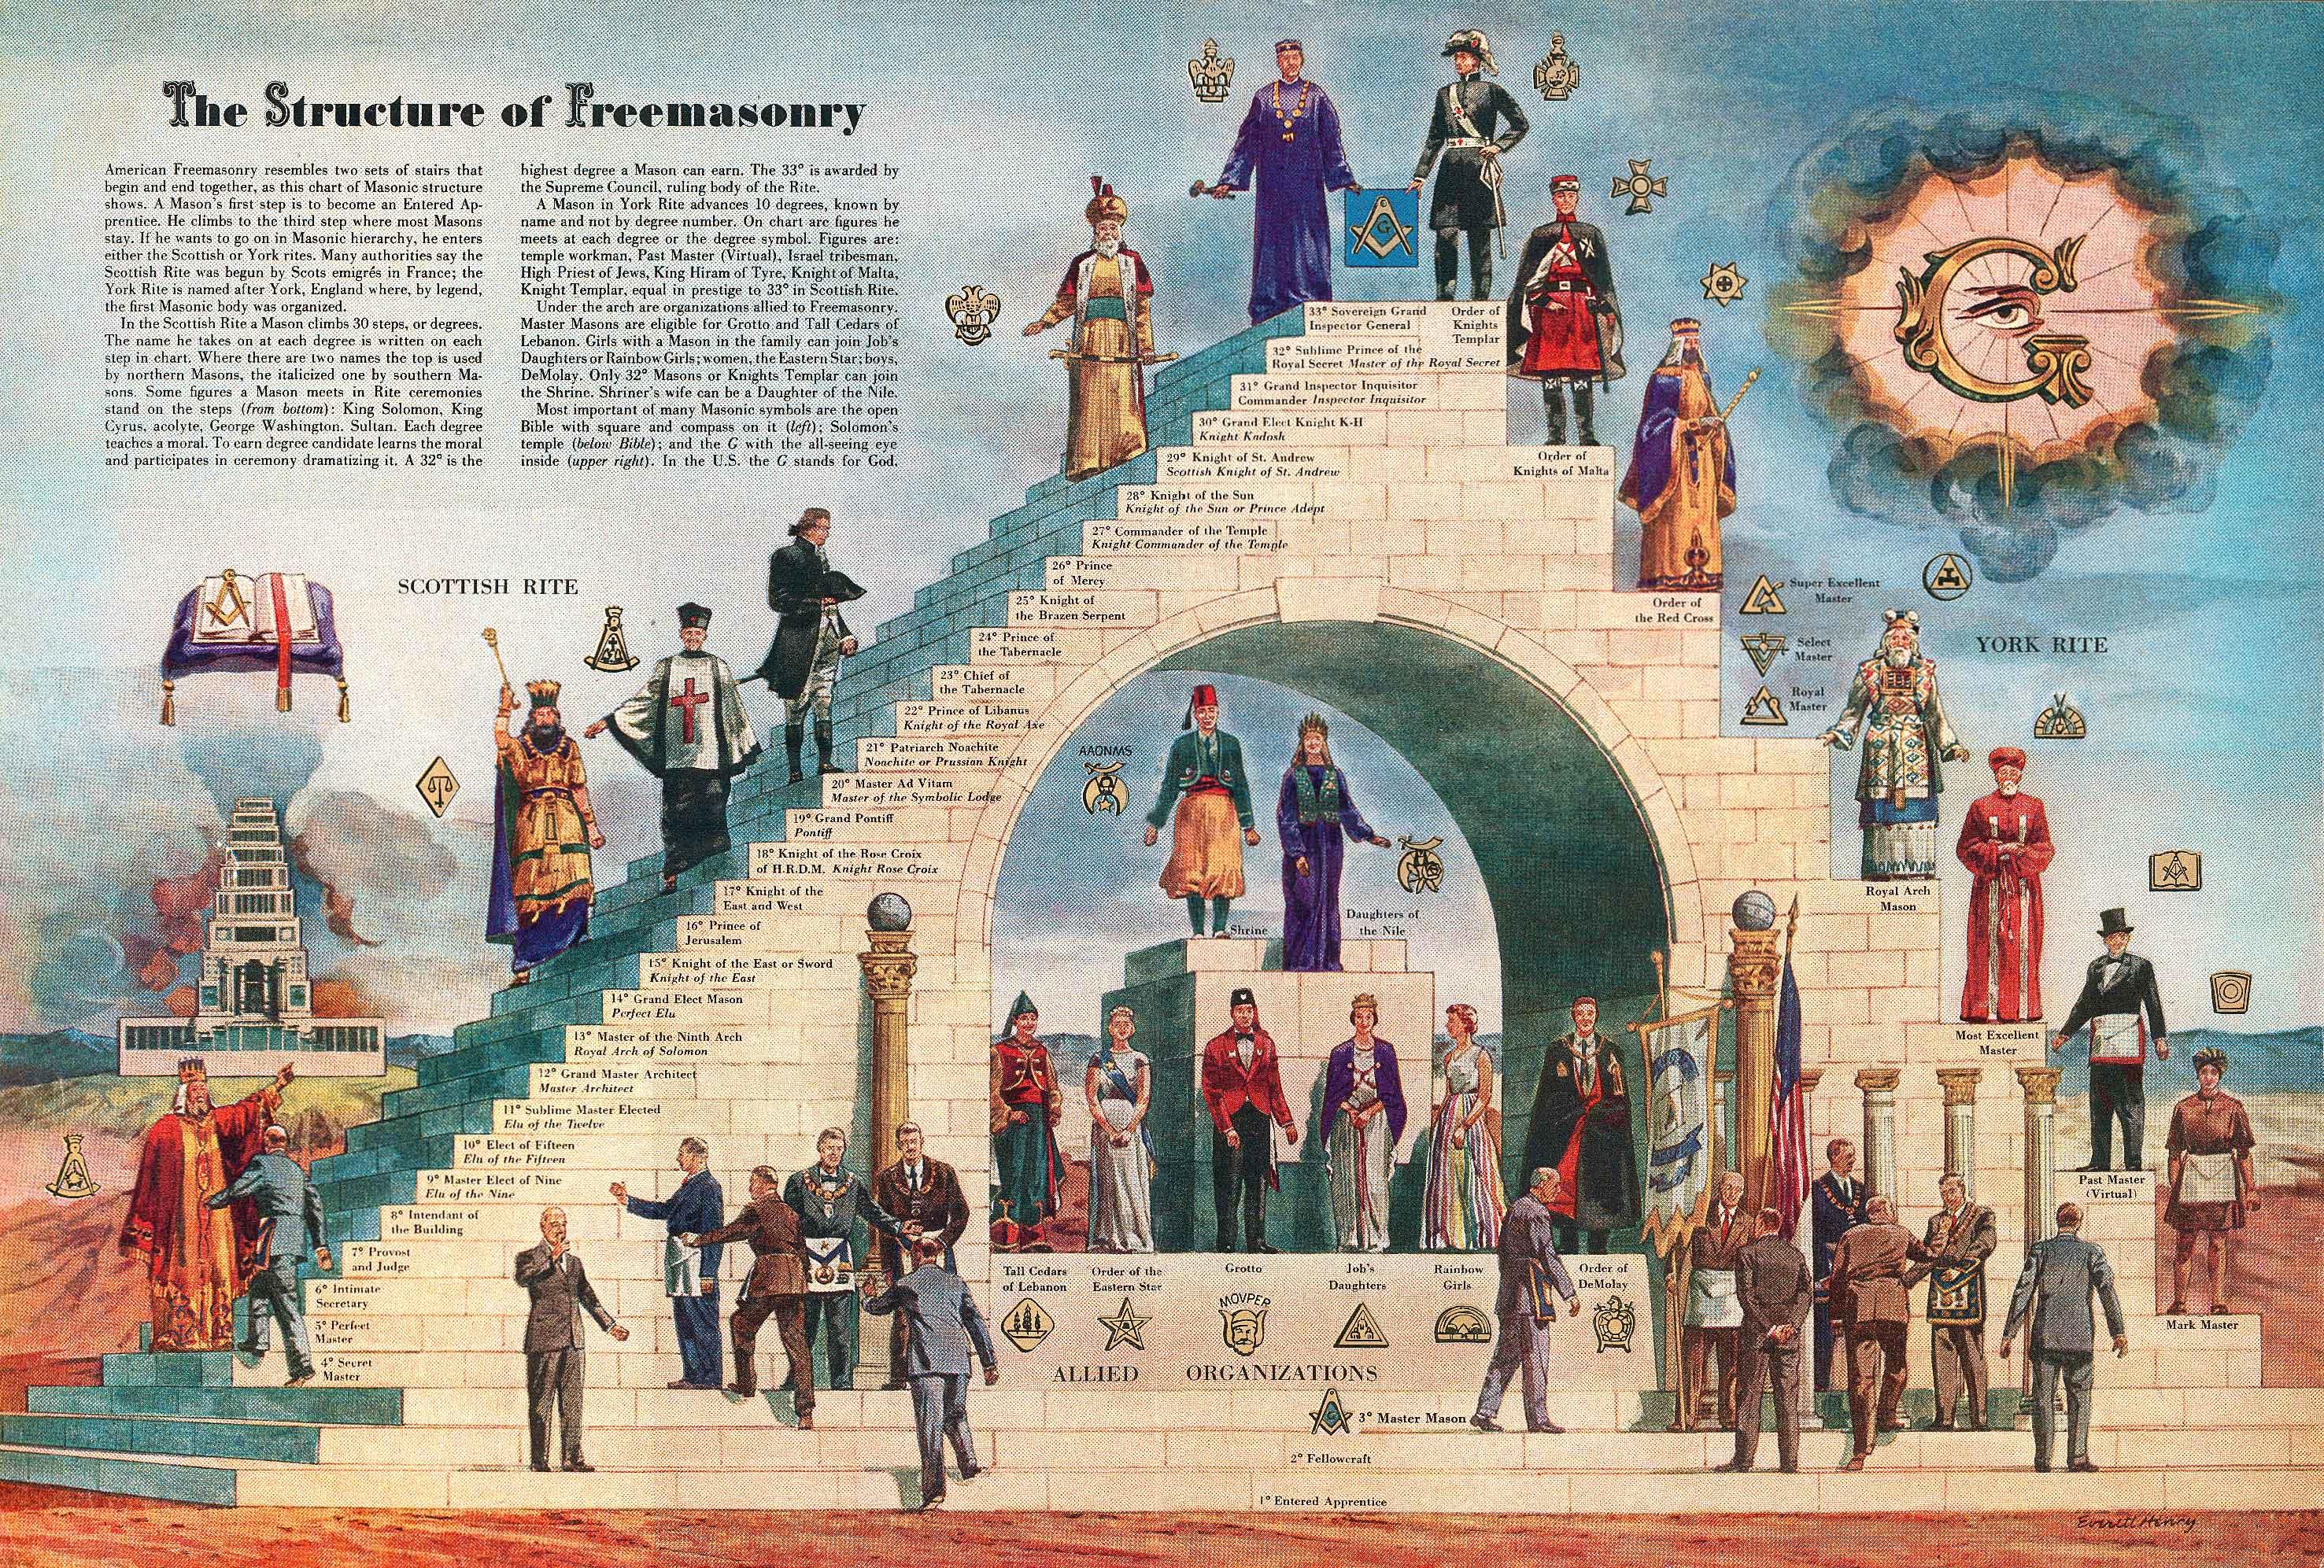 Пирамида посвящений регулярного масонства до 33 градуса